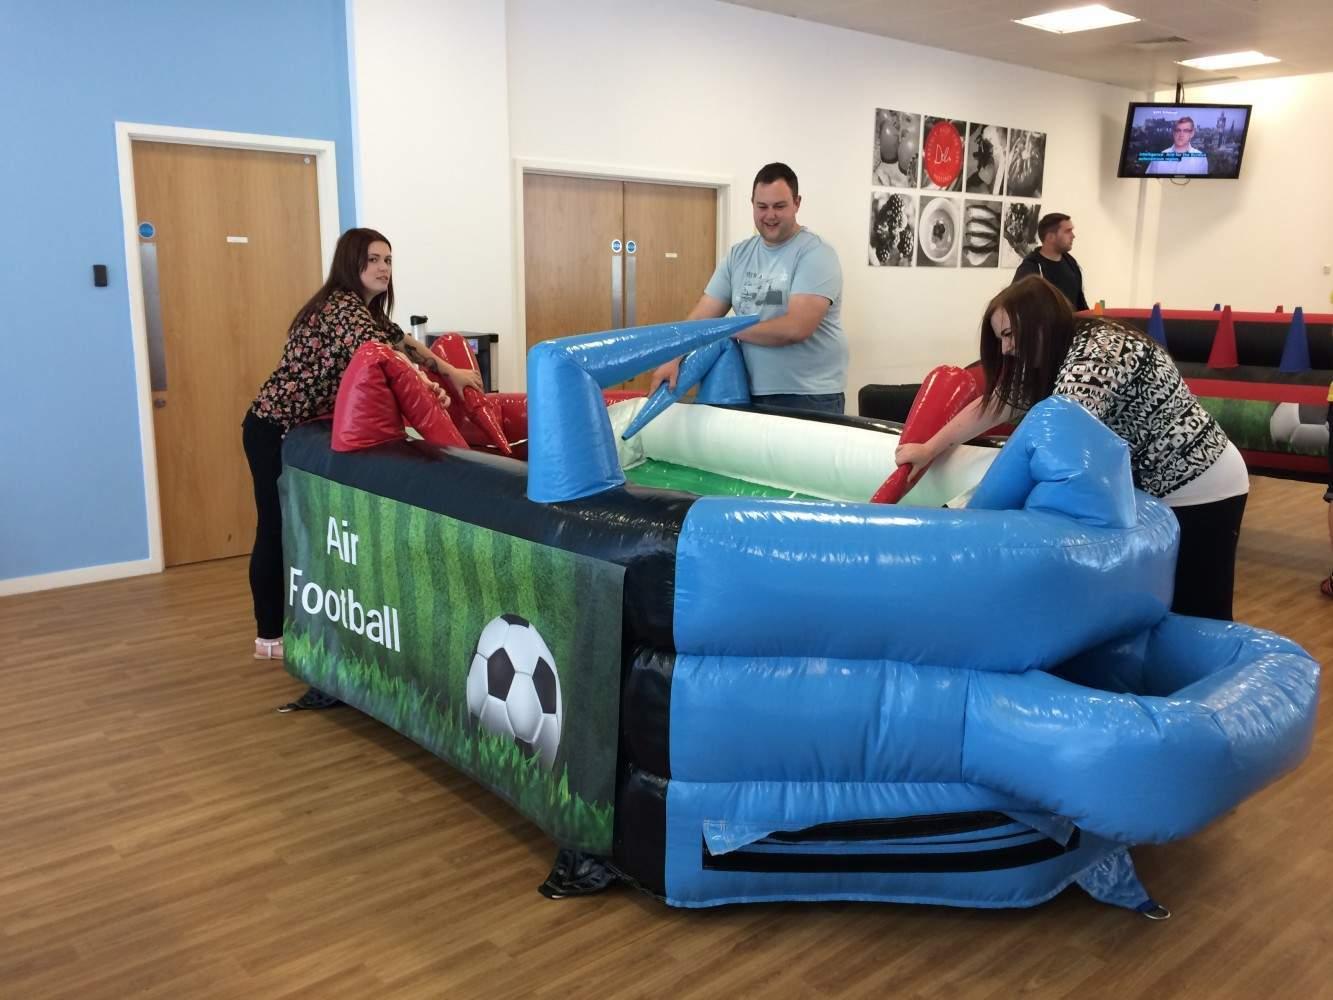 Inflatable Air Football Air Hockey Hire London South East